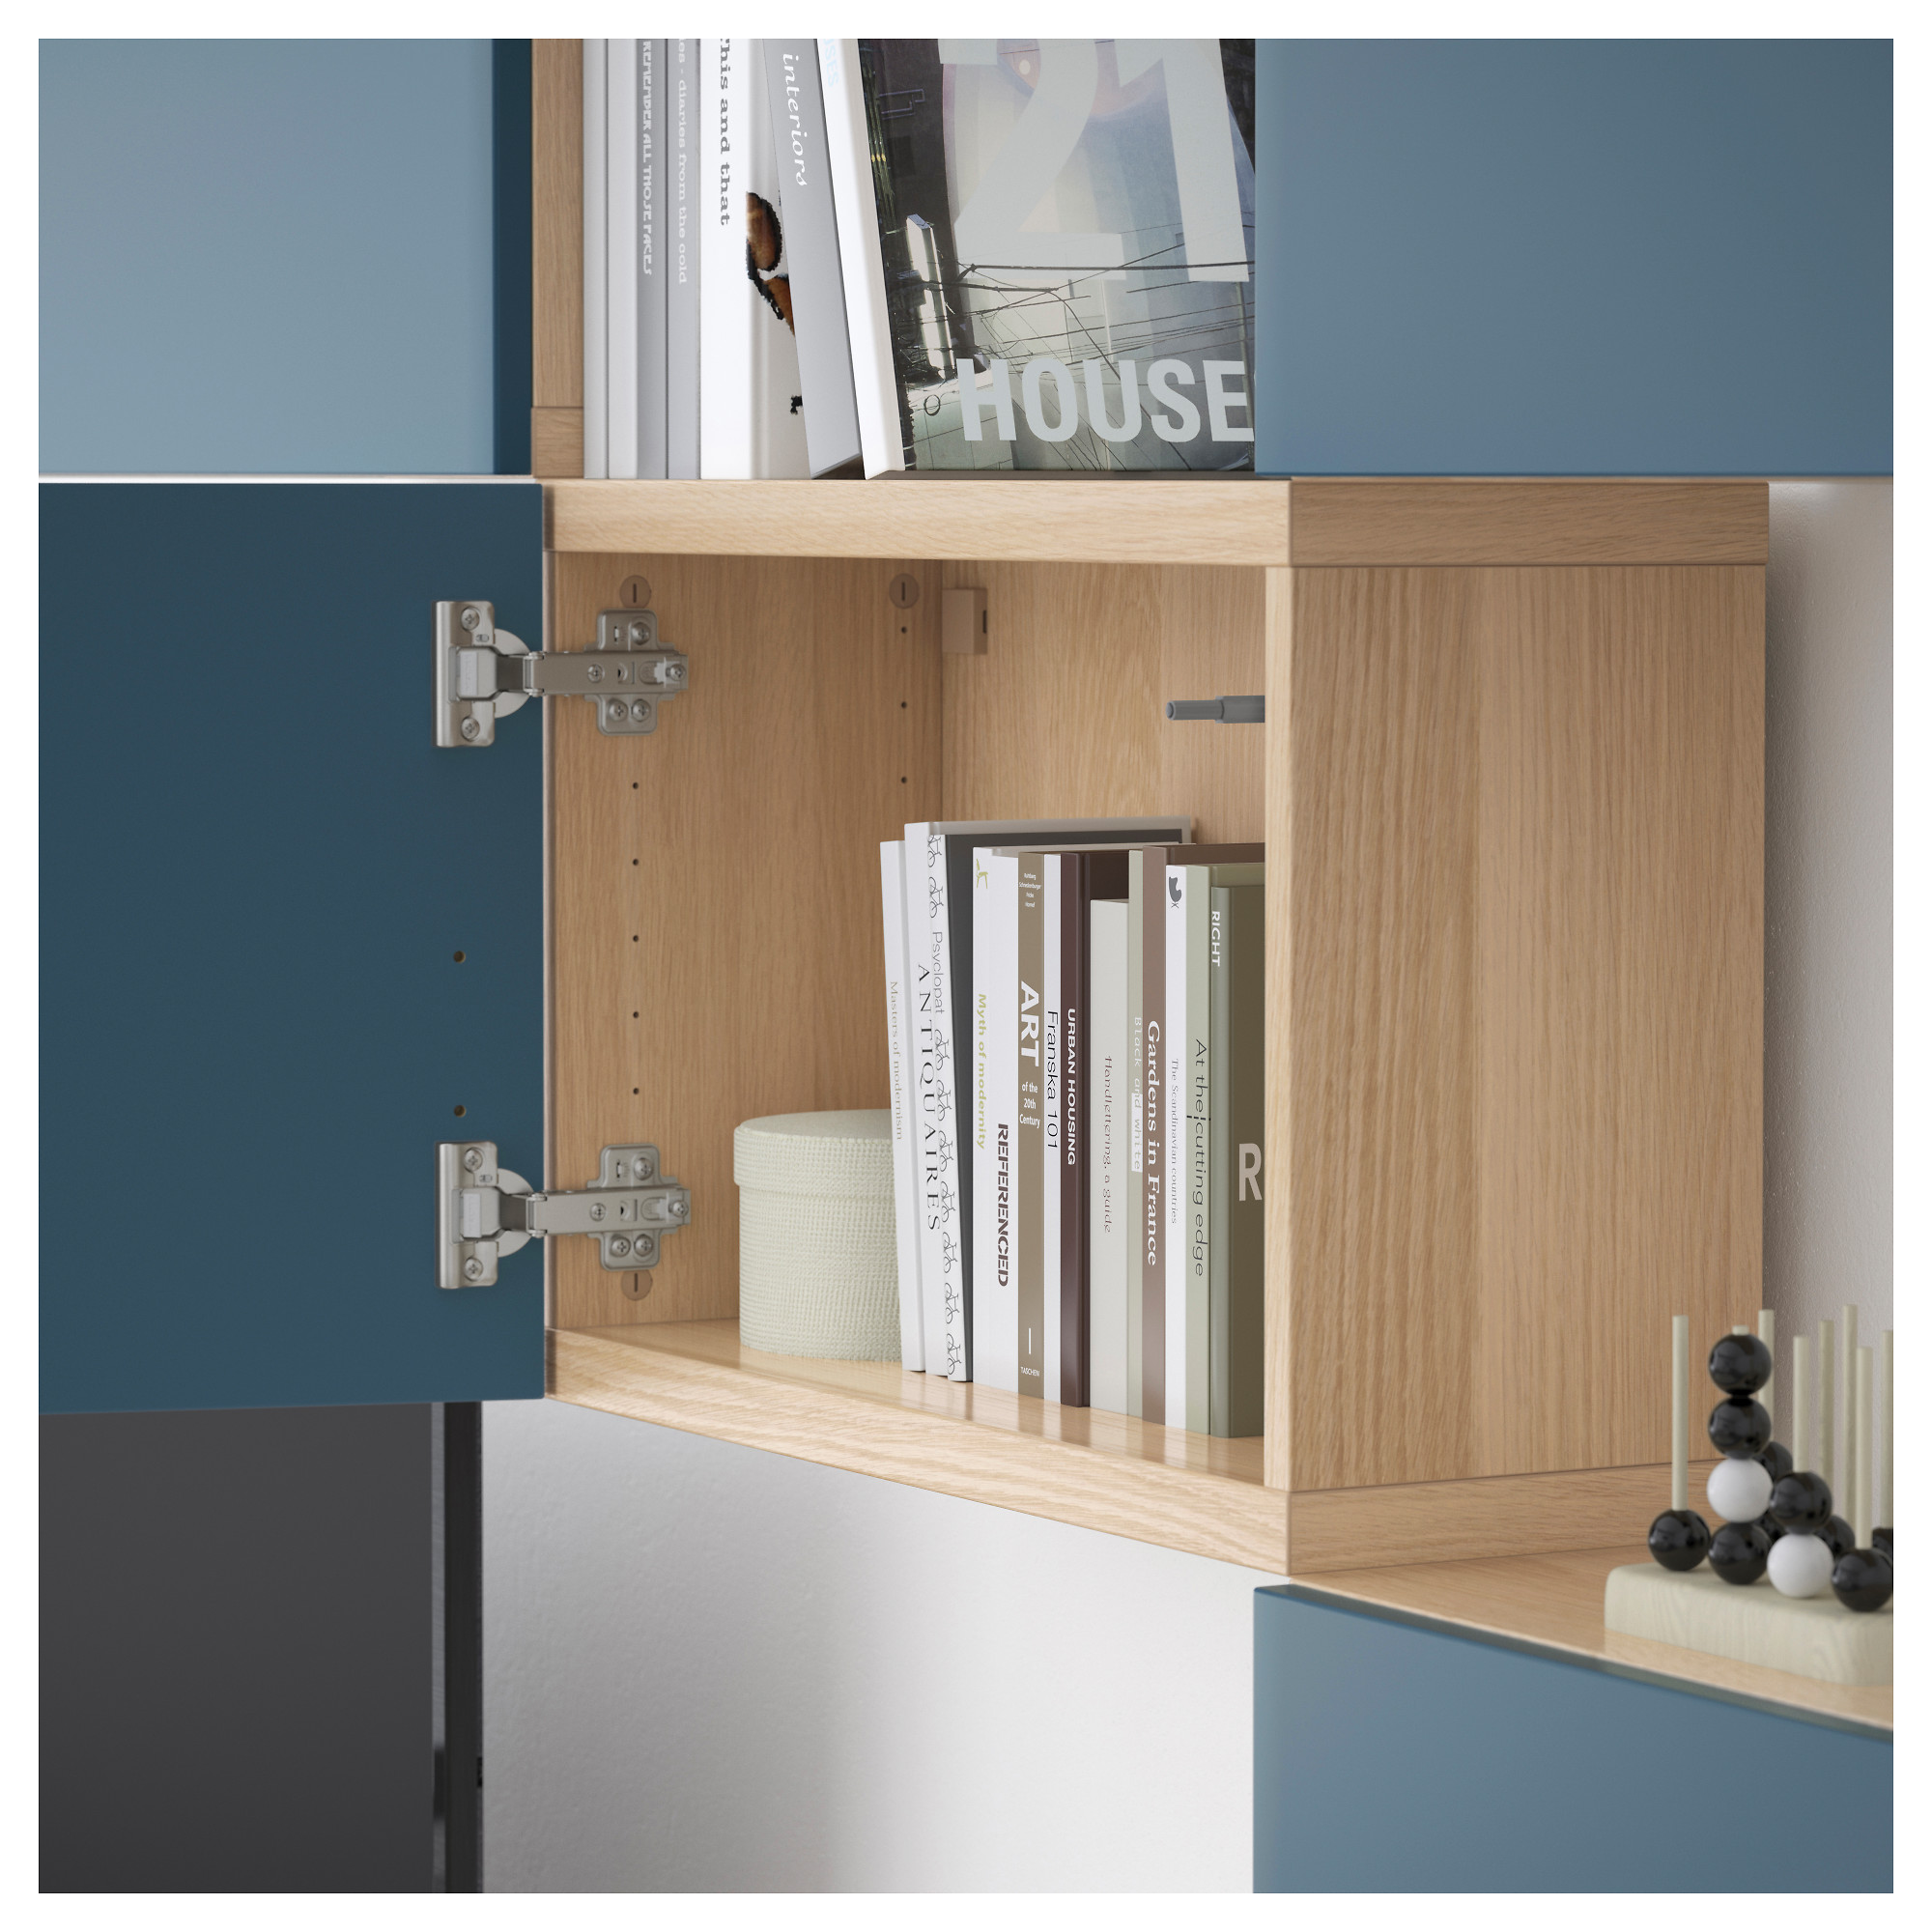 Шкаф для ТВ, комбинация БЕСТО темно-синий артикуль № 592.516.66 в наличии. Интернет магазин IKEA Минск. Недорогая доставка и монтаж.